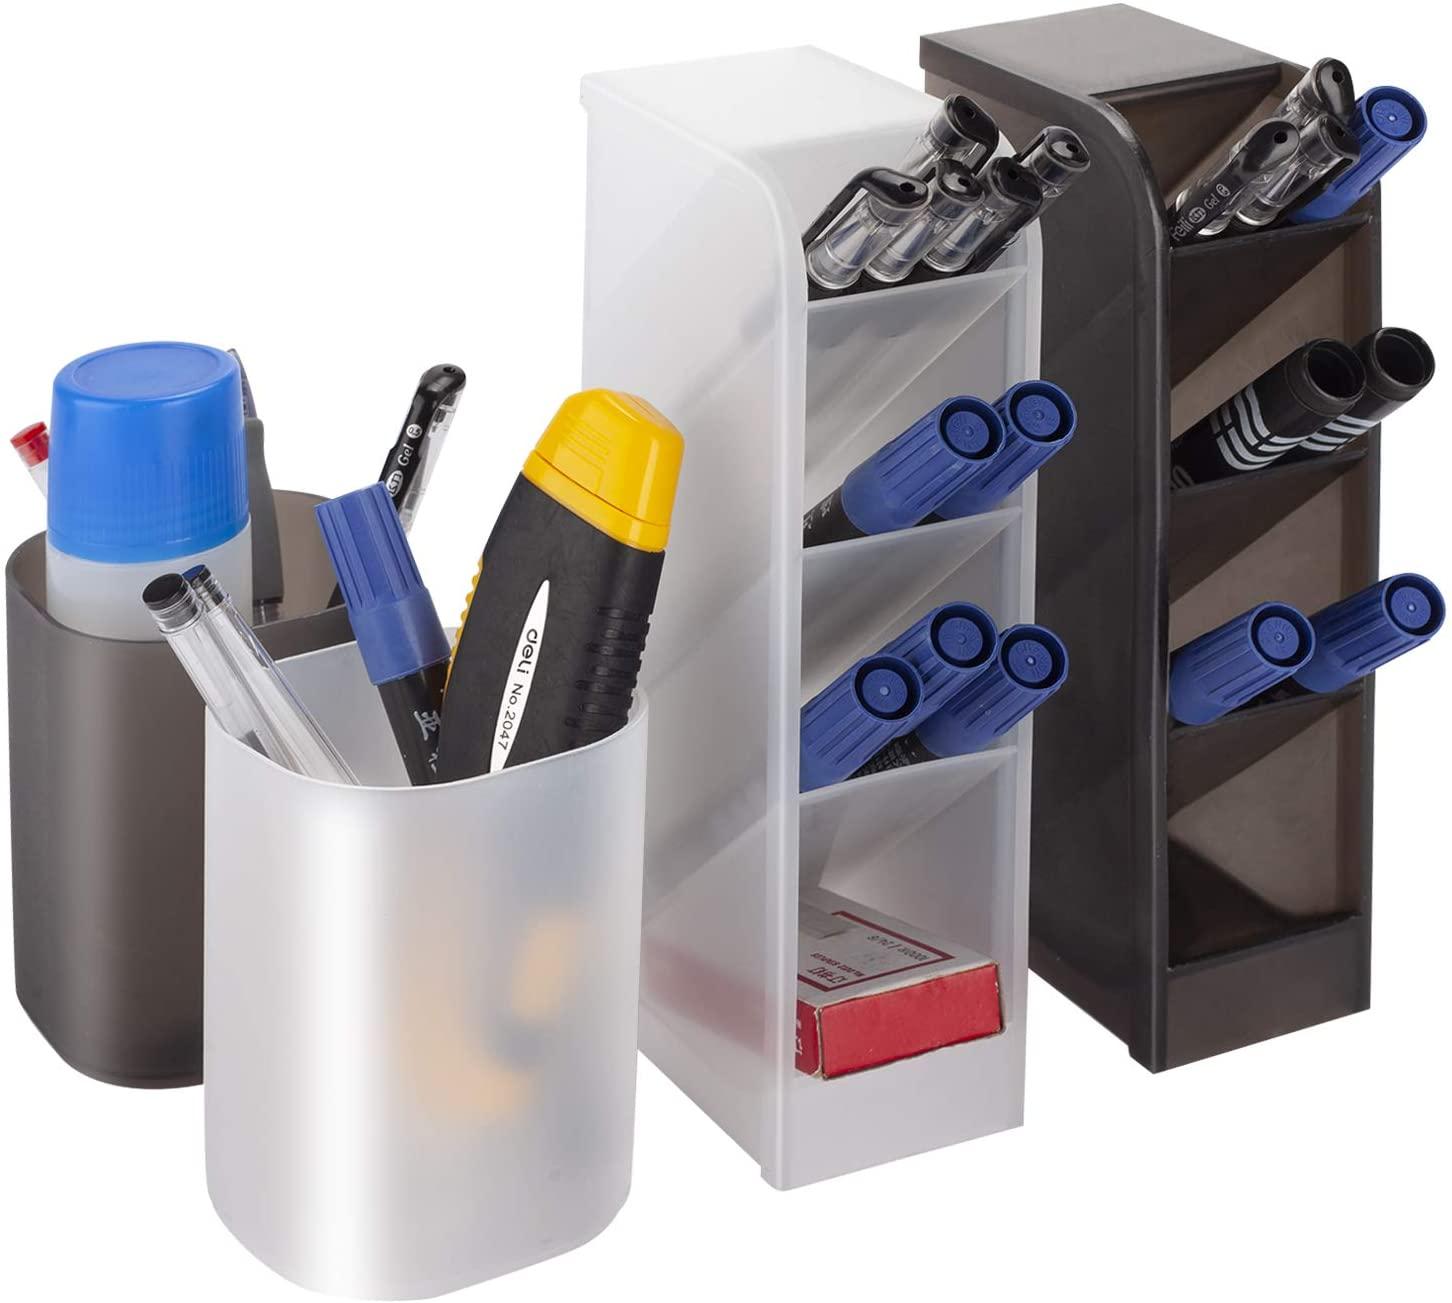 Xueheng 2Pcs Desk Organizer 2Pcs Pen Holder for Office, School, Home Supplies, Pen Makeup Brushes Pencil Storage (Black & White)